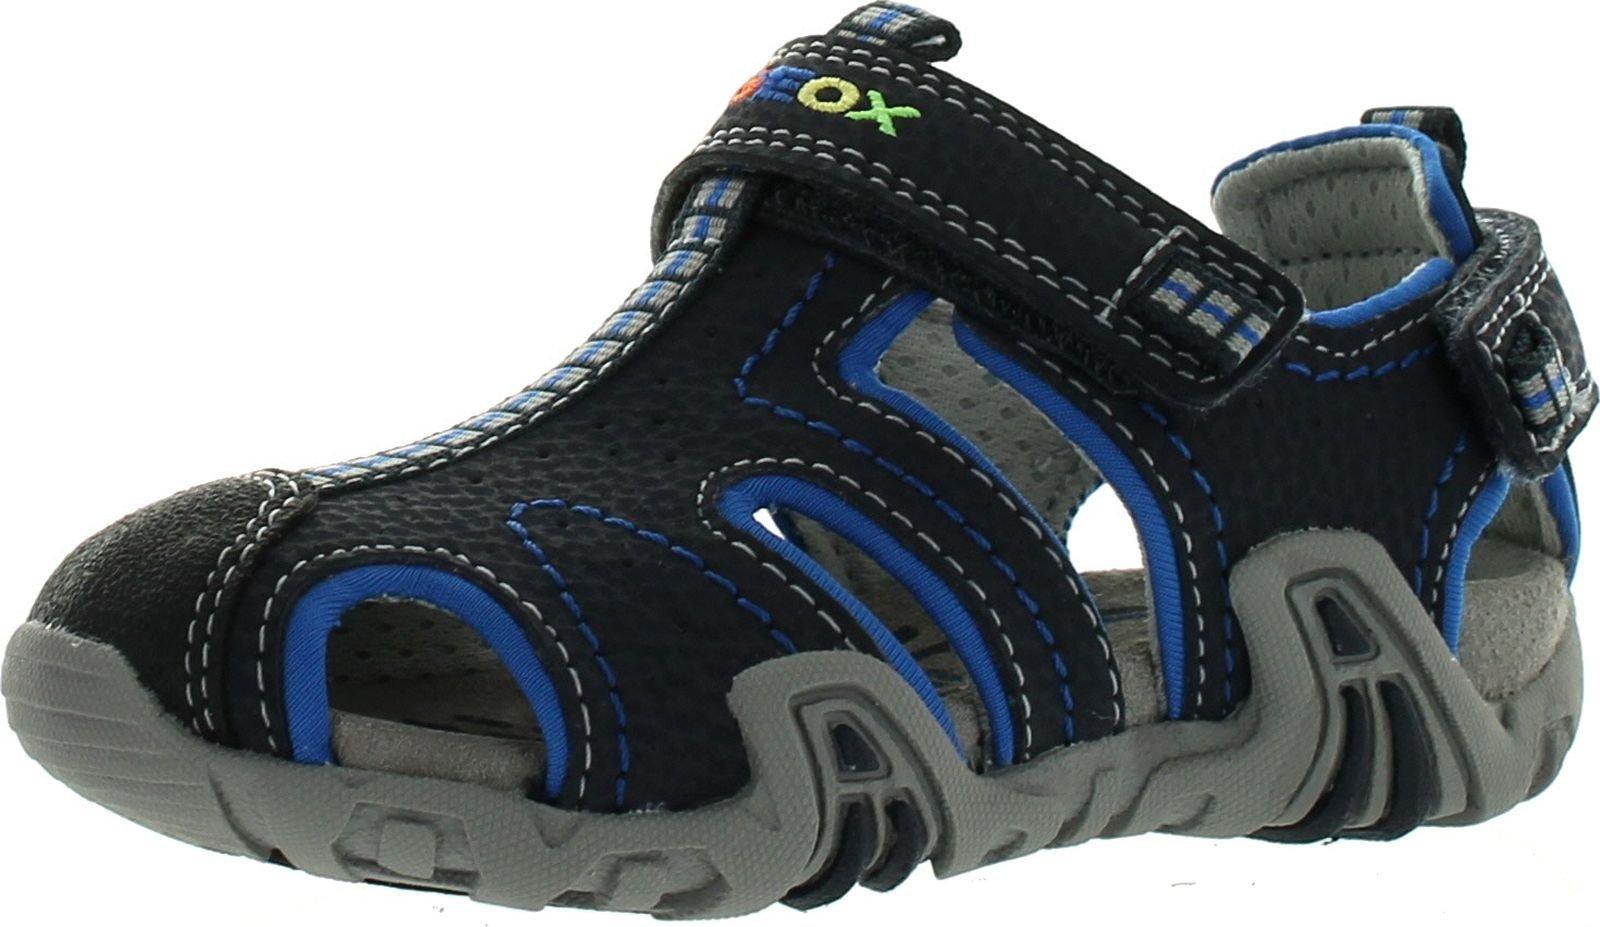 Geox Boys Kraze Fashion Athletic Fisherman Sandals,Navy/Light Blue,22